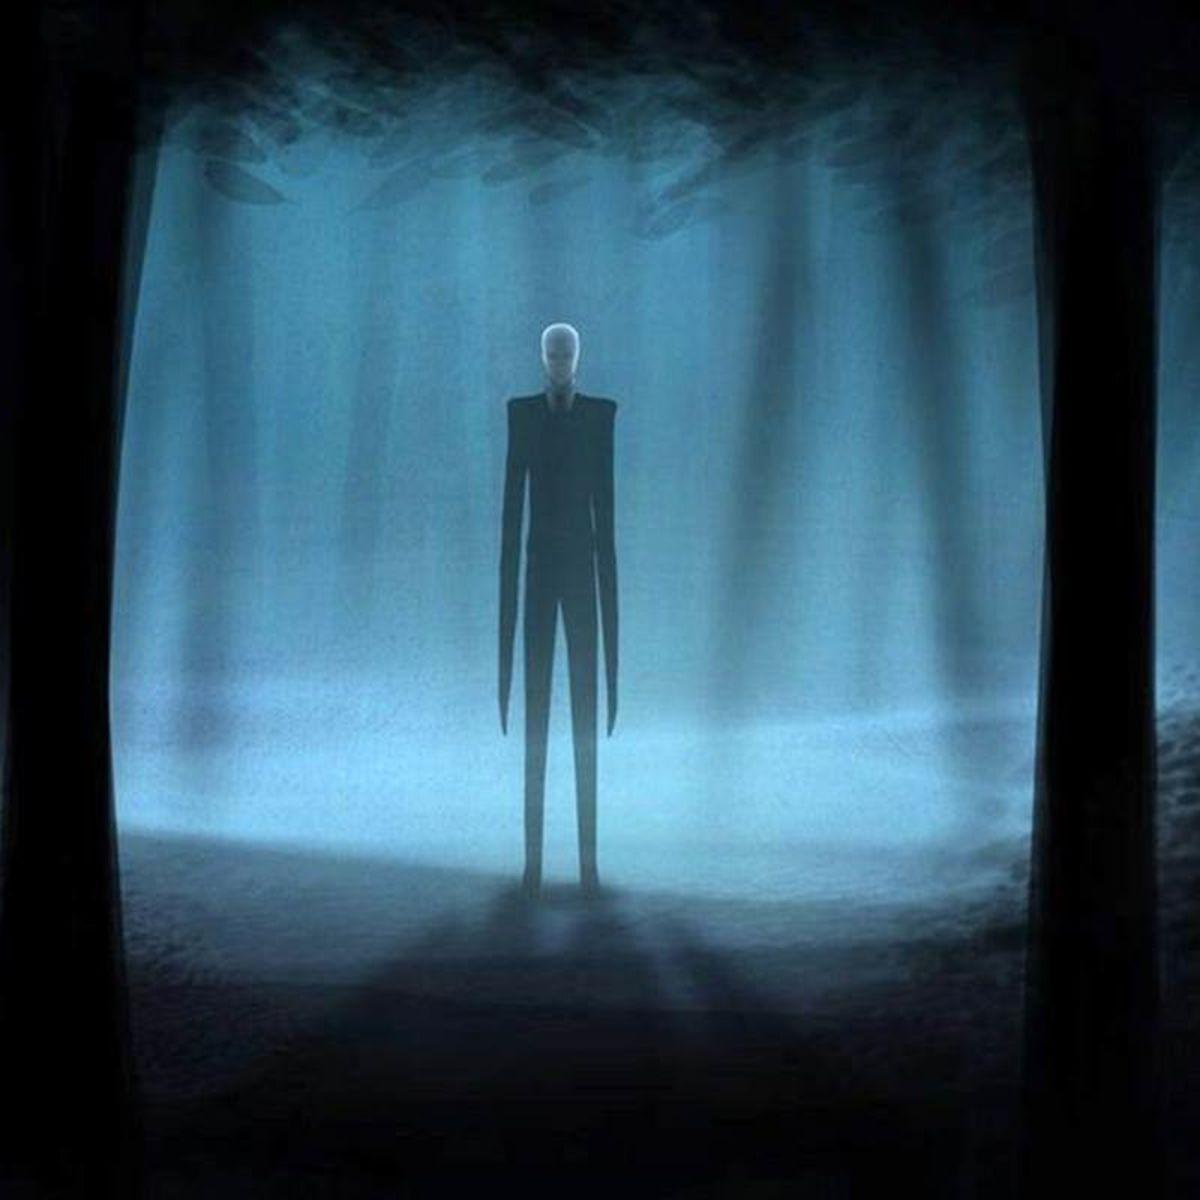 140606-slender-man-mn-735_297a98e4b78681fe7a932d8c5069f8db.nbcnews-fp-1200-800.jpg